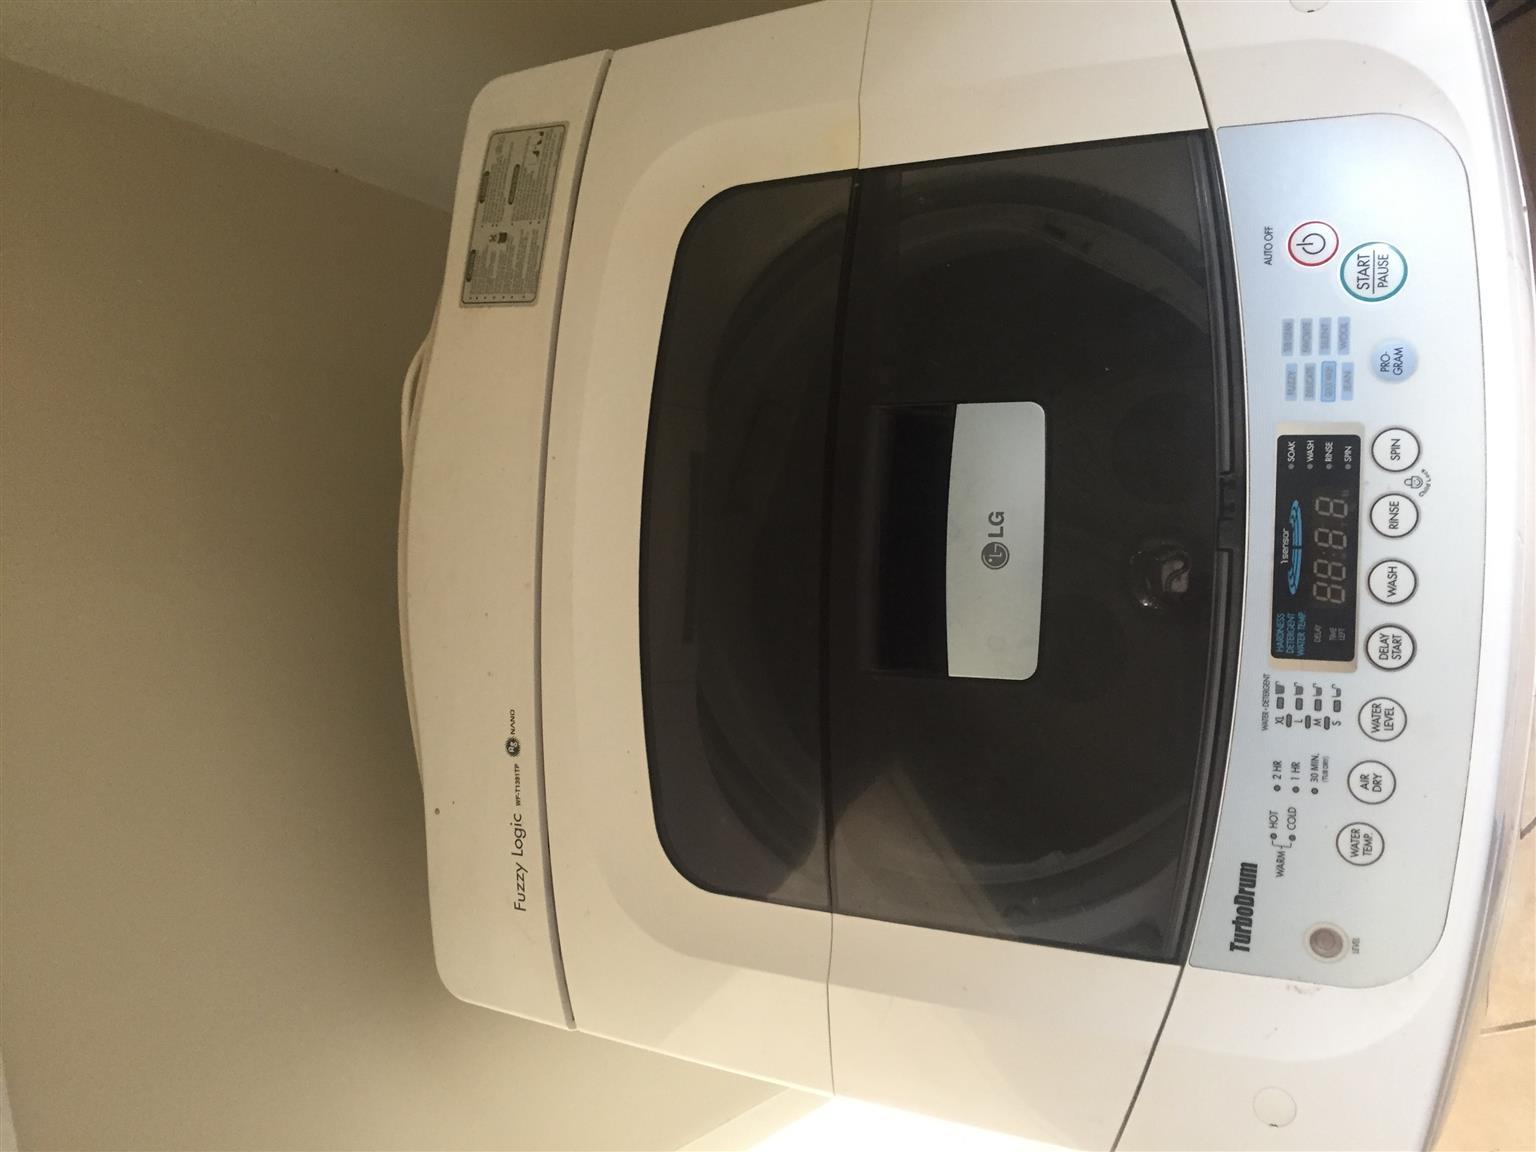 LG Turbodrum 13kg